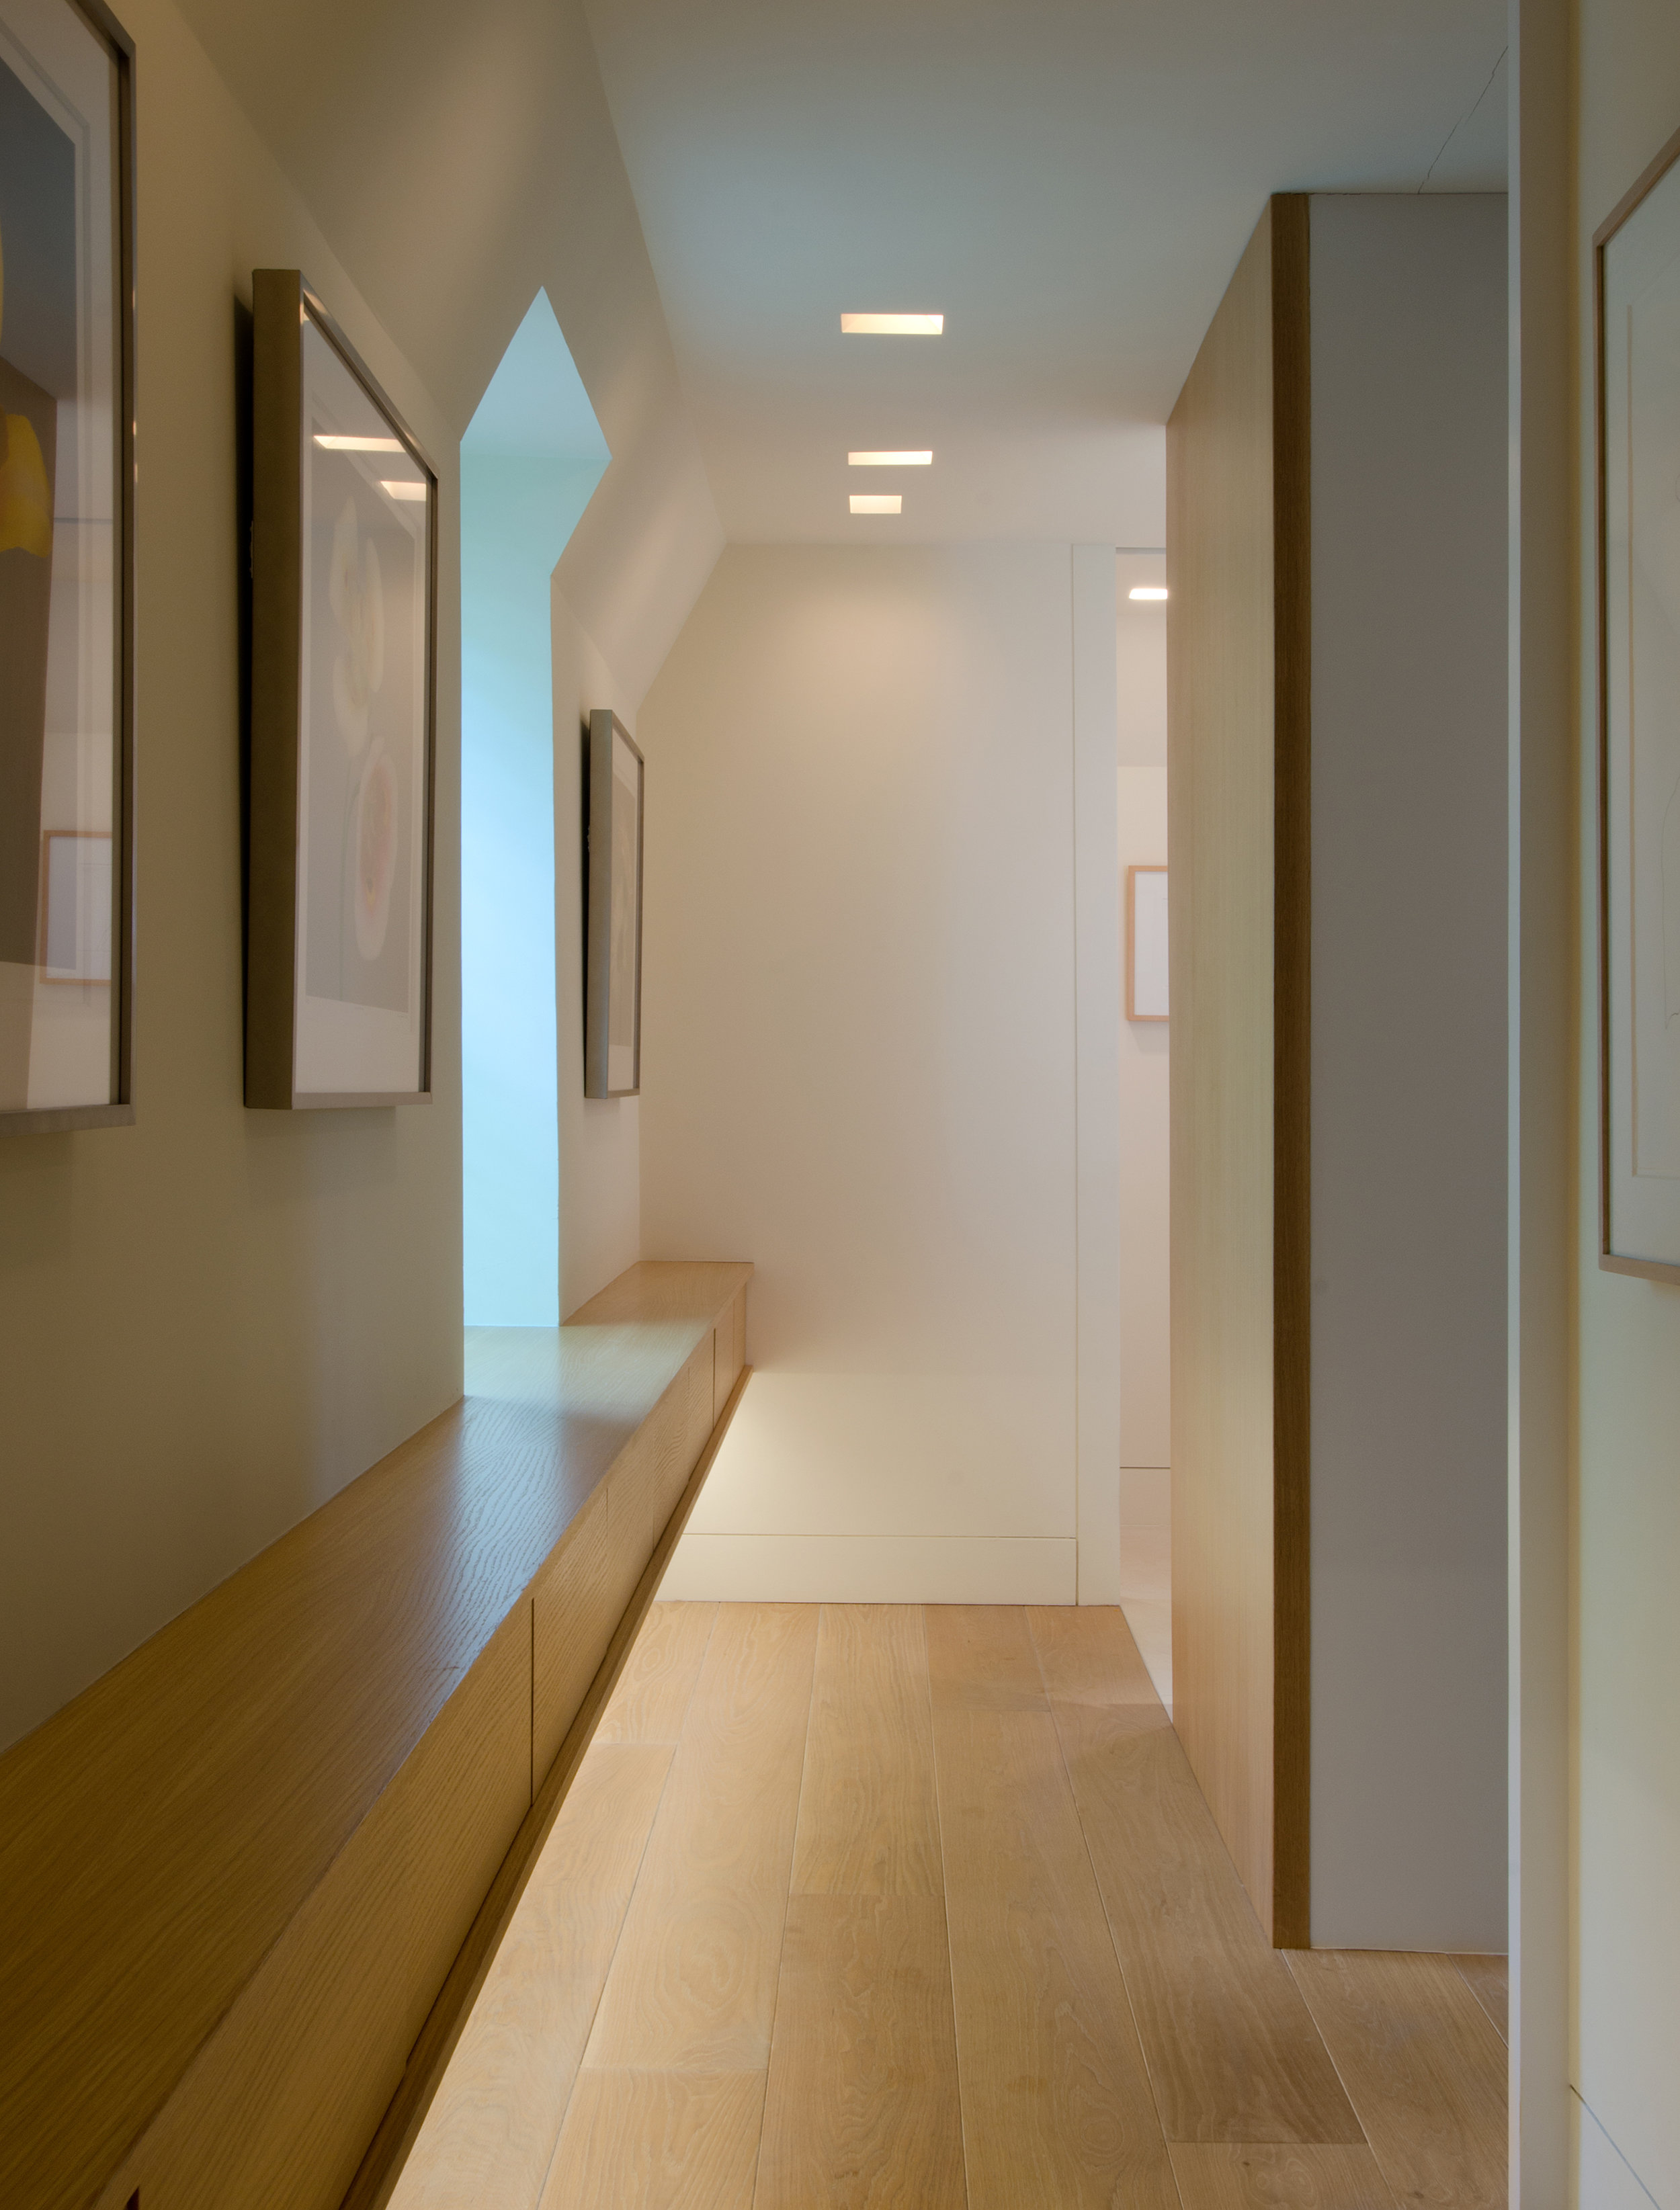 02-Master-Suite-Renovation_Corridor.jpg